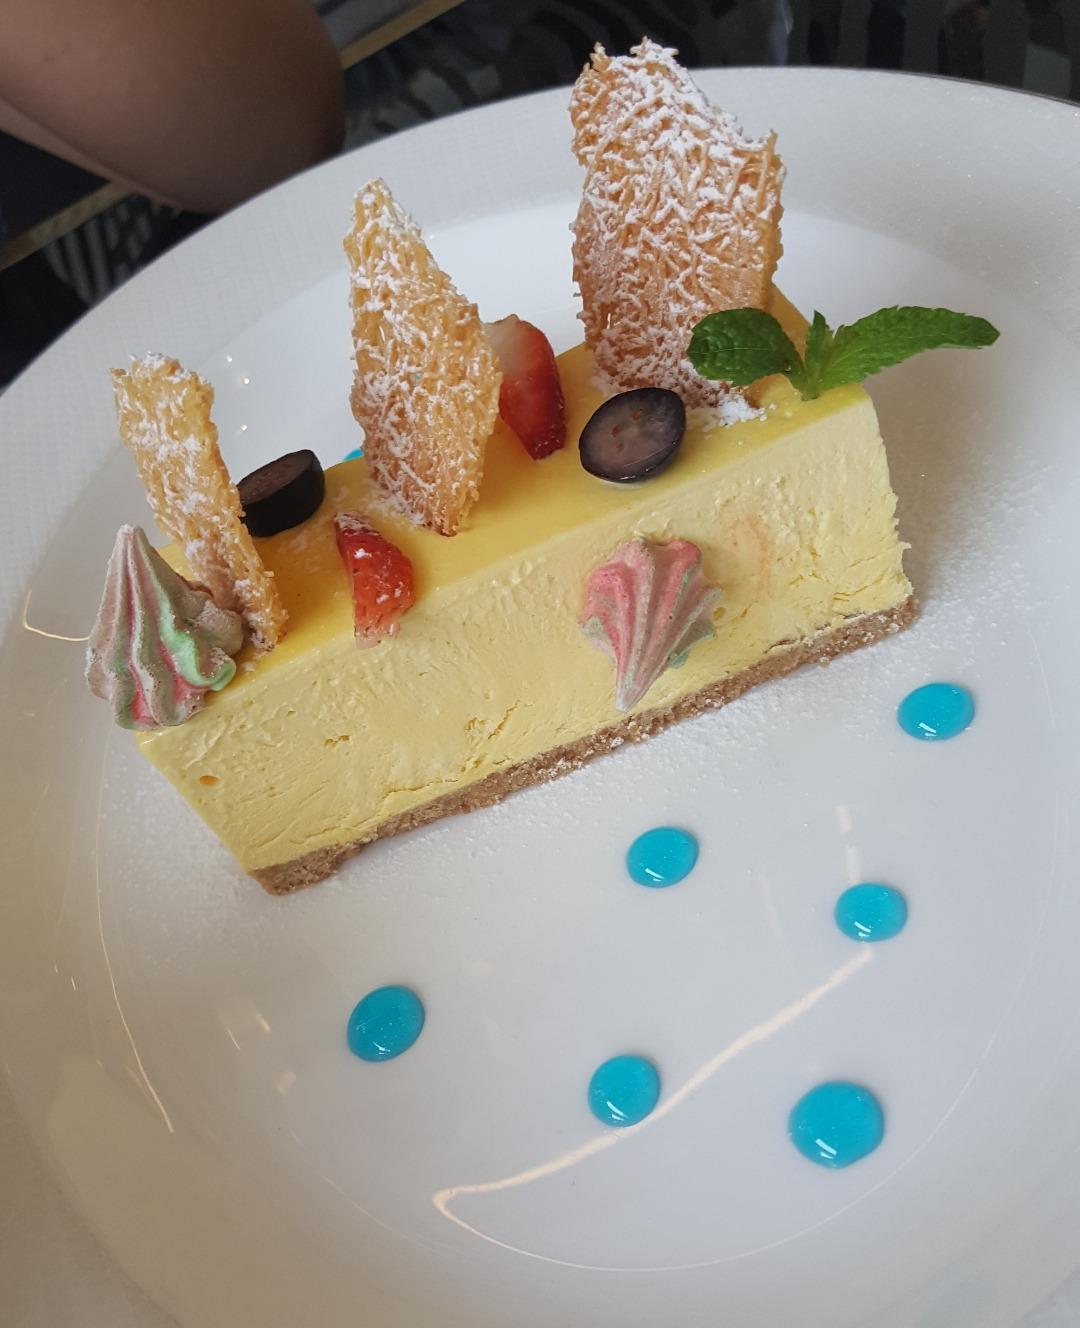 saffron cheesecake 😋😋😋😋😋 @ Cavalli Caffe - Bahrain